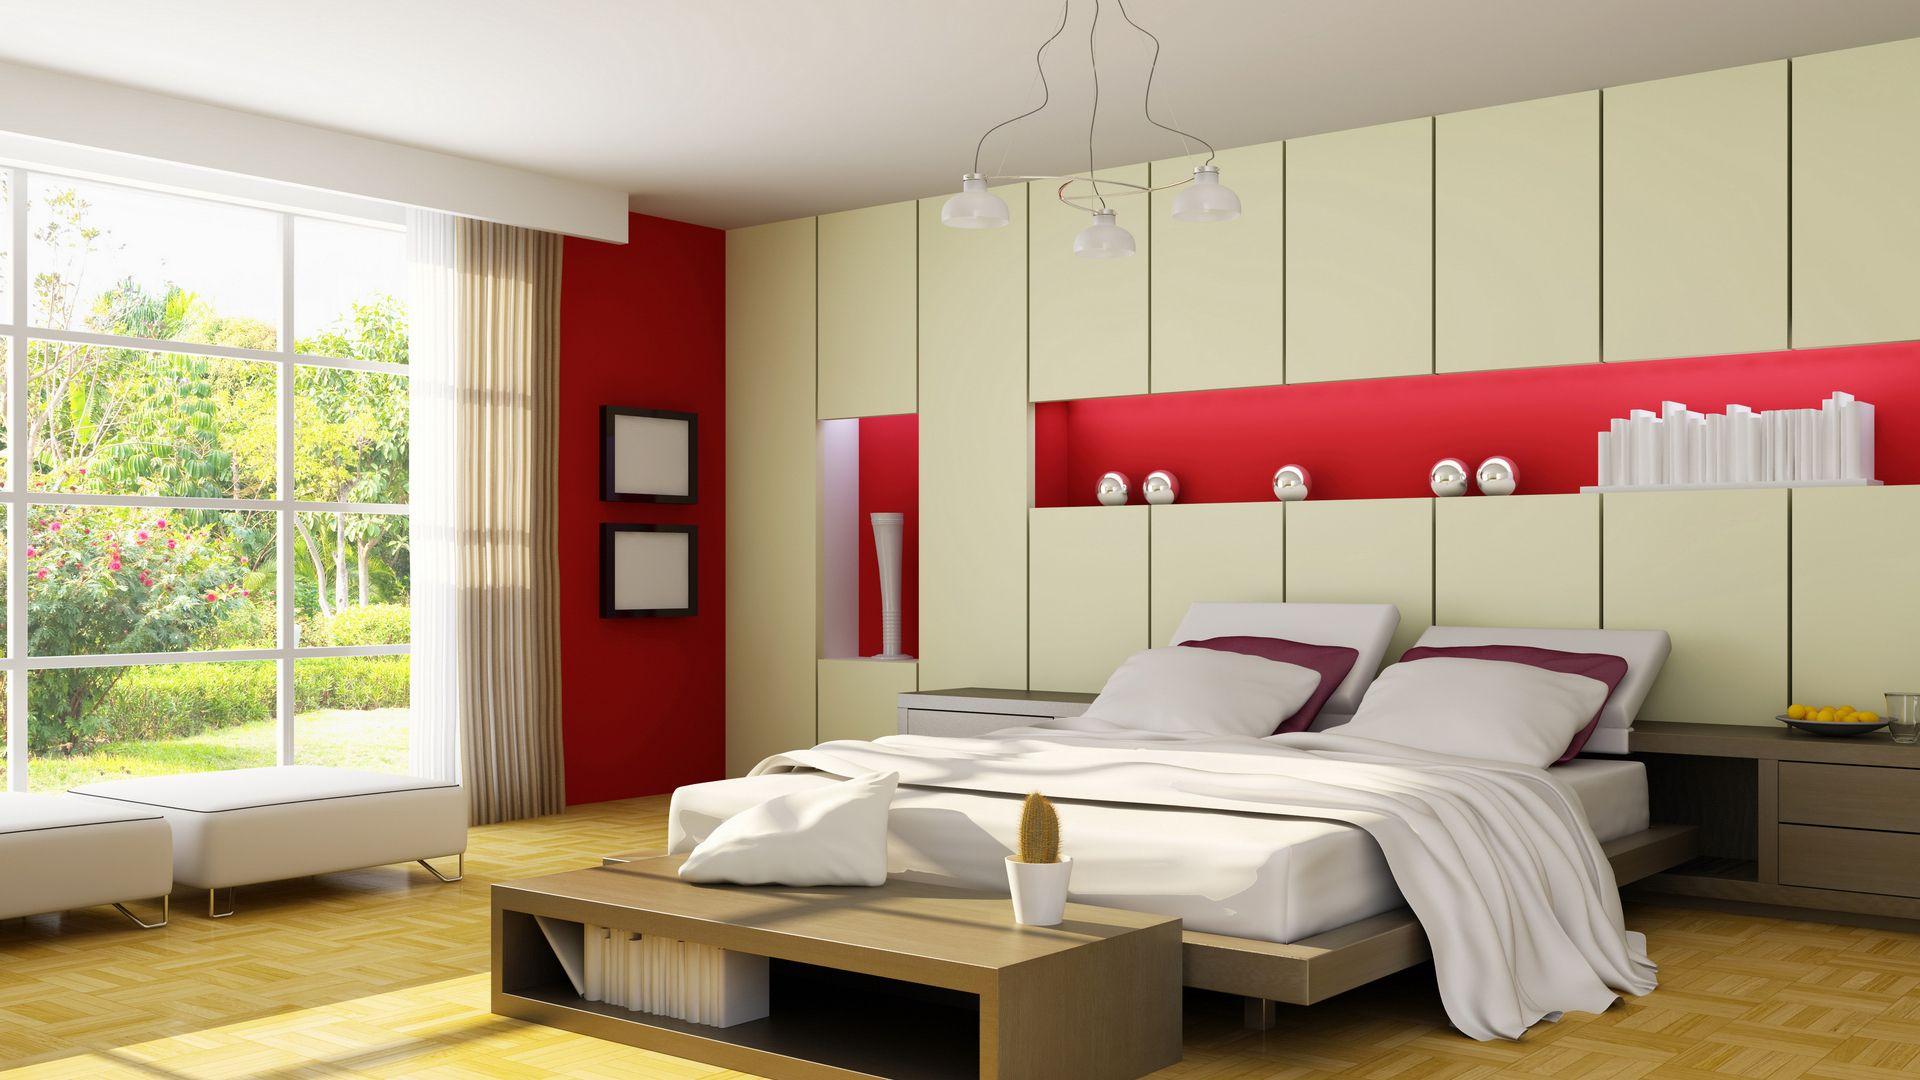 Pin de Sedes Tecnocasa M xico en Dormitorios Pinterest